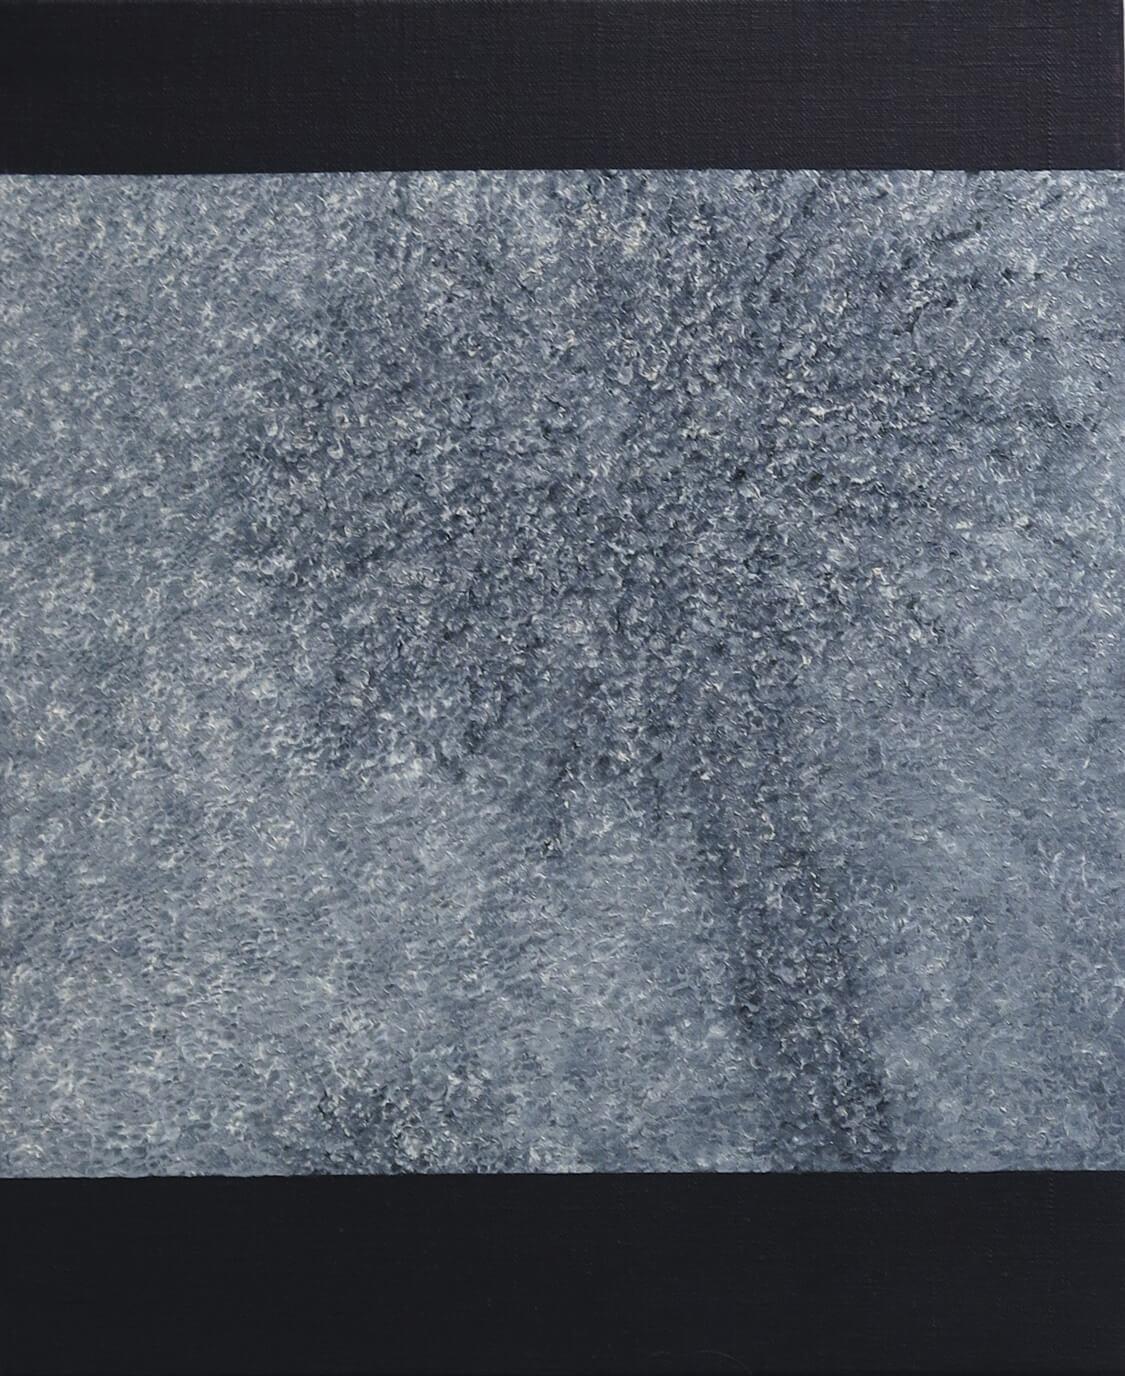 Palmtree I - Oil on Canvas, 60 x 50 cm, 2013